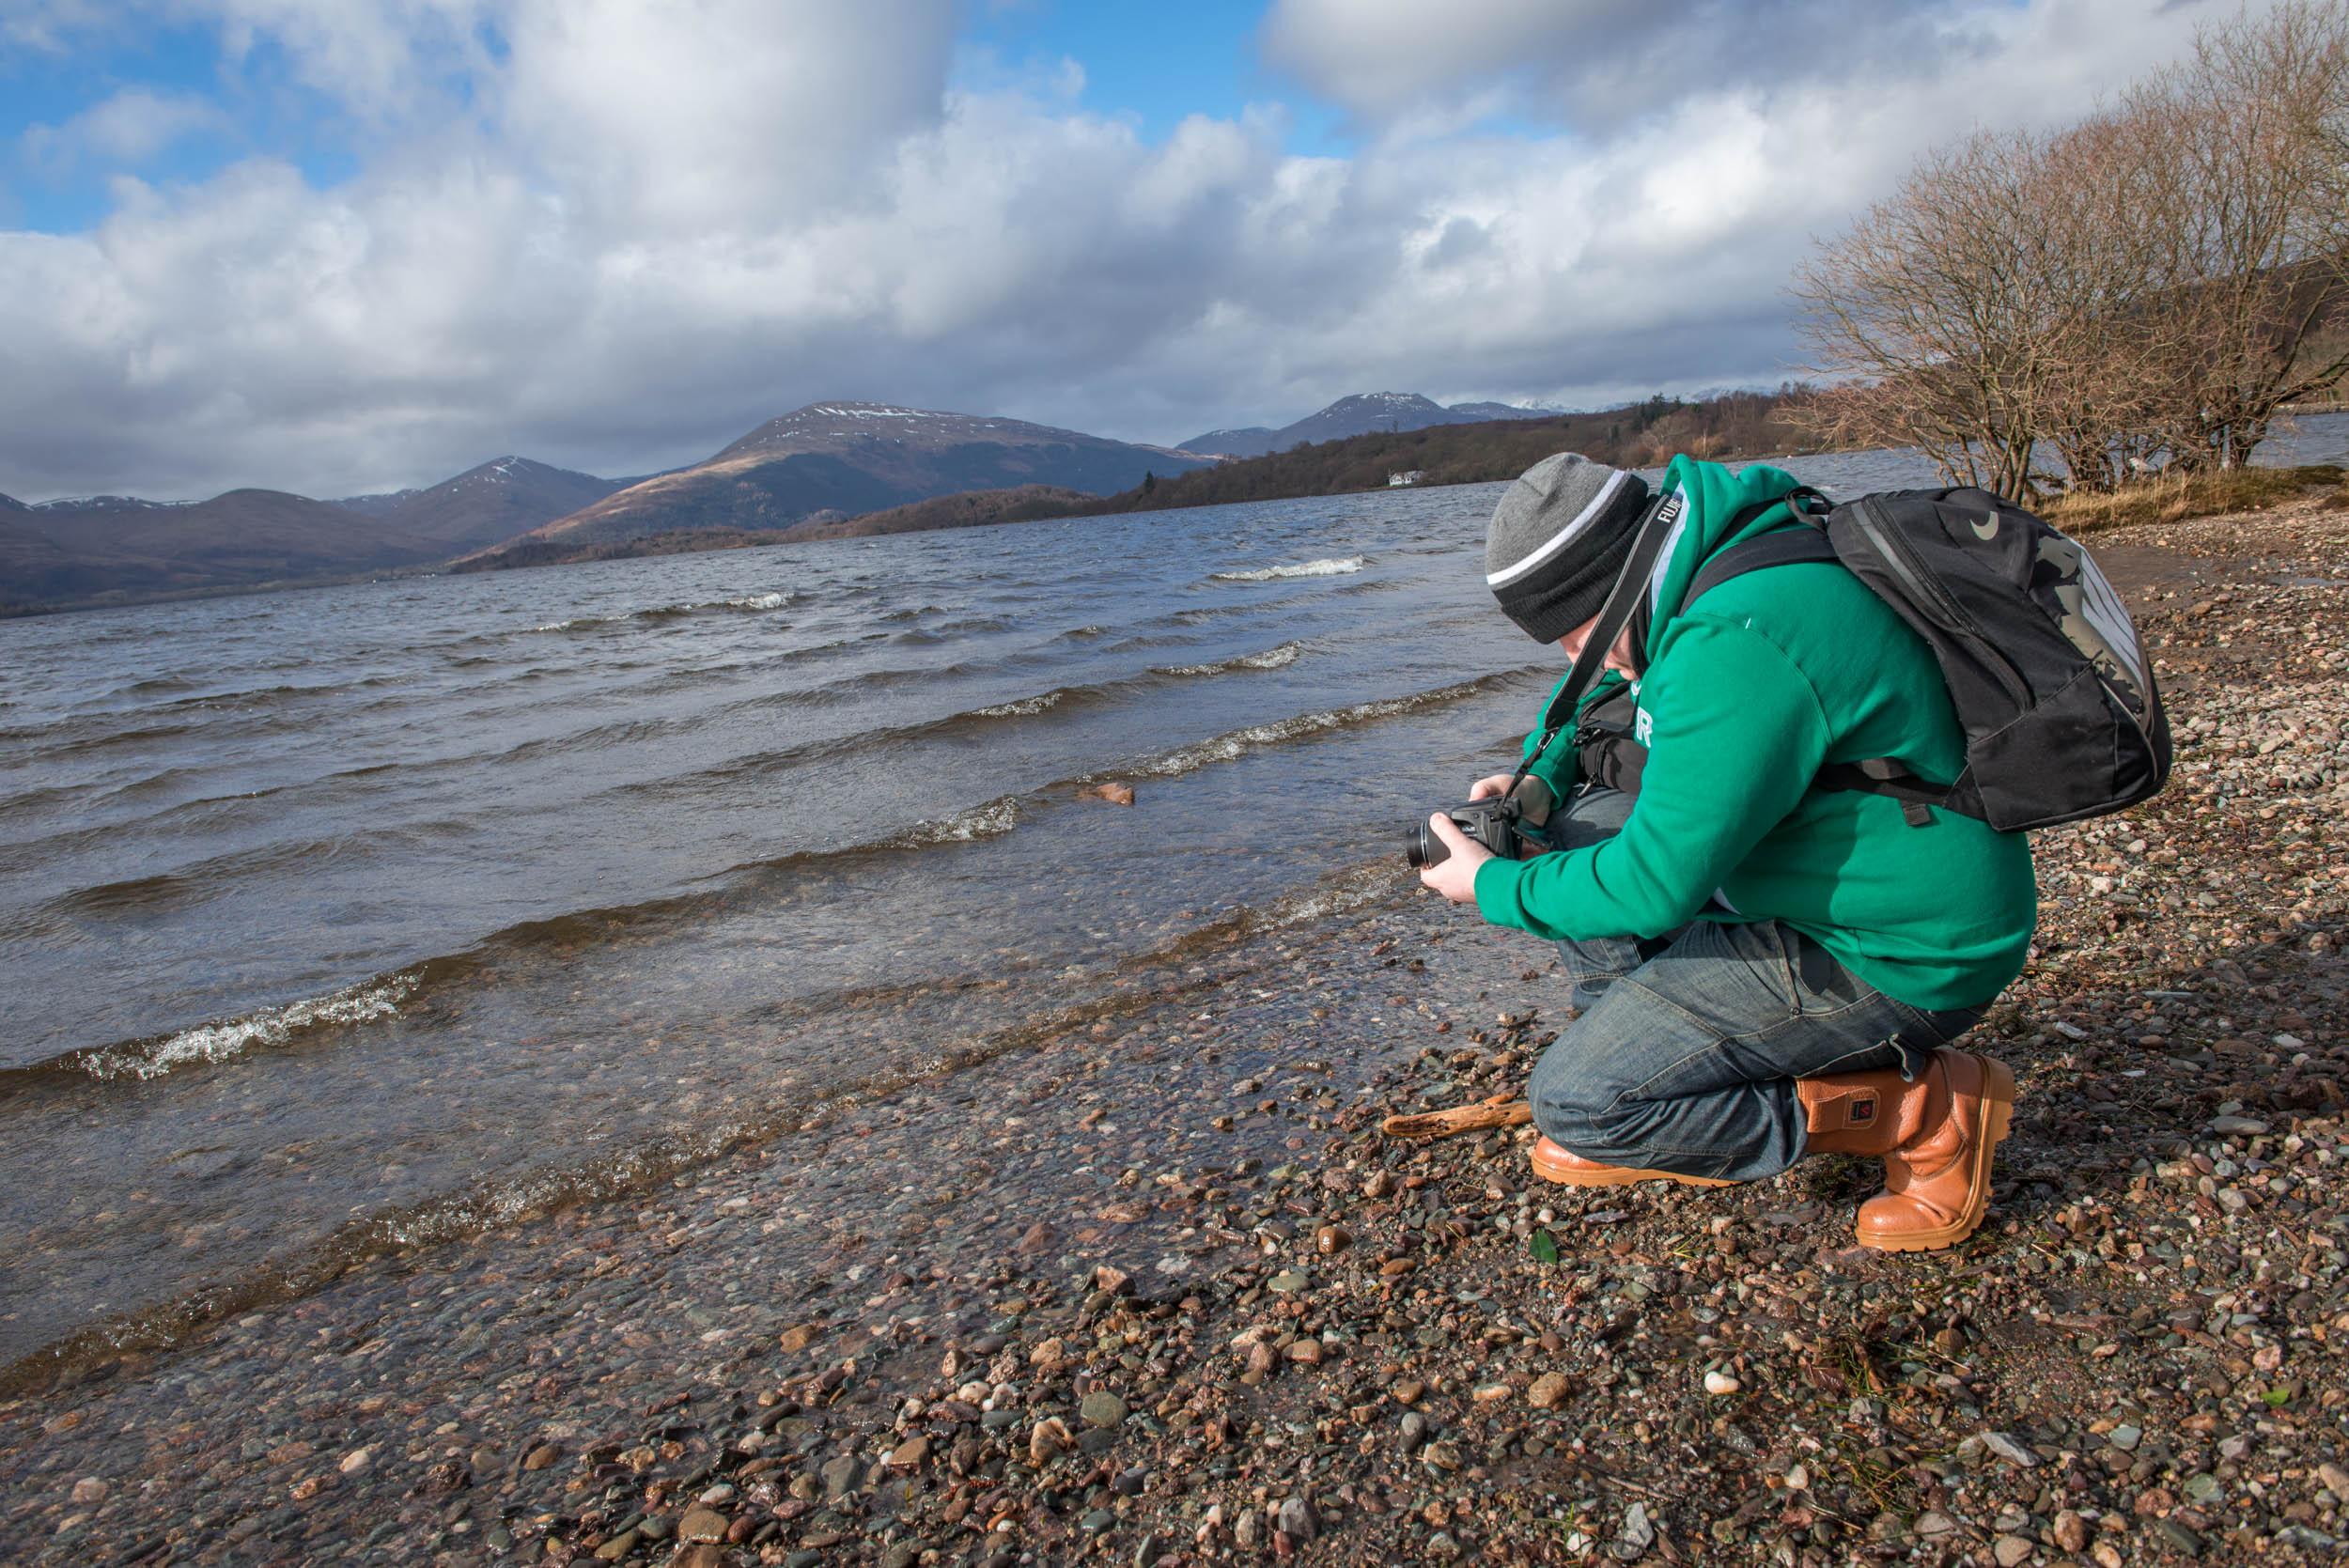 Take-Better-Photographs-Loch-Lomond-4622.jpg